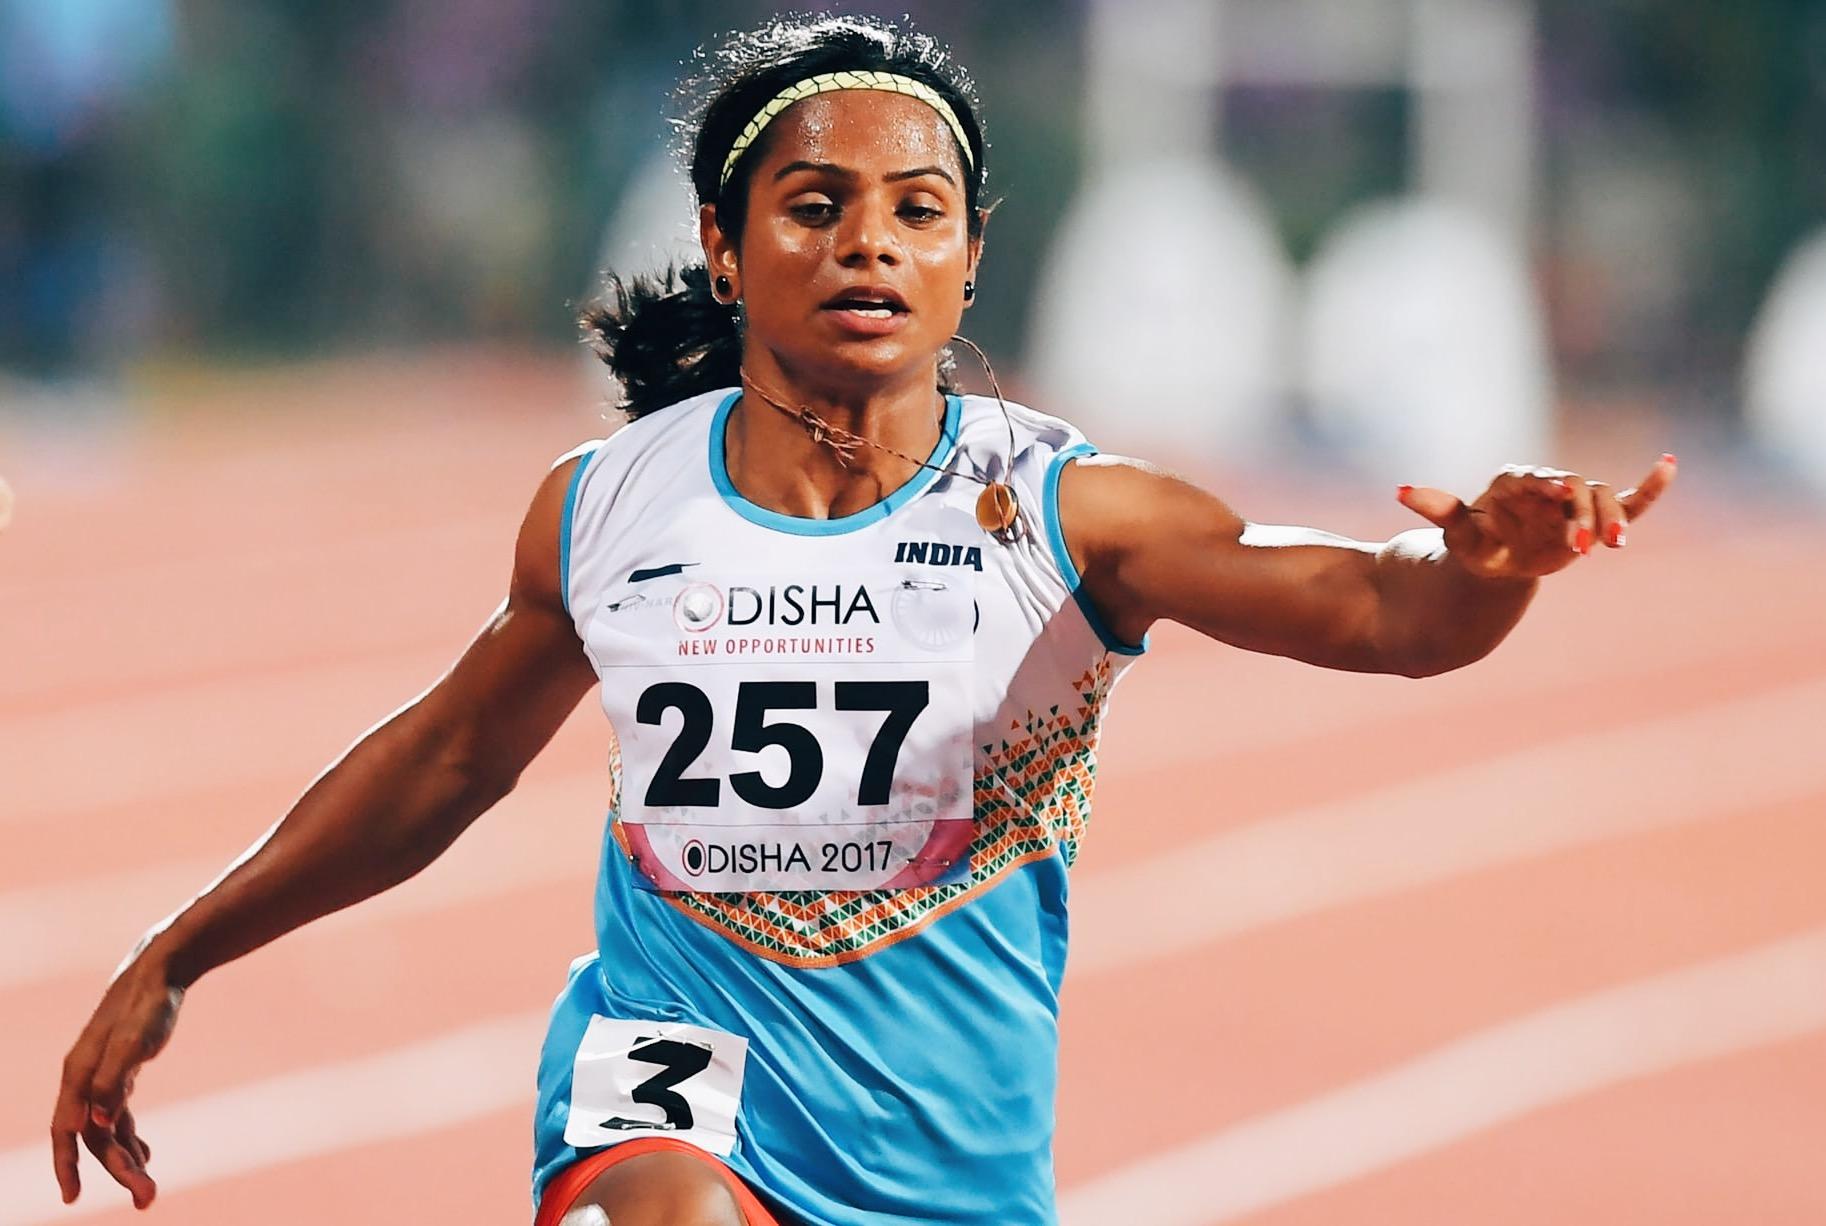 Dutee-chand-semenya-athletics-women-in-sport.jpg